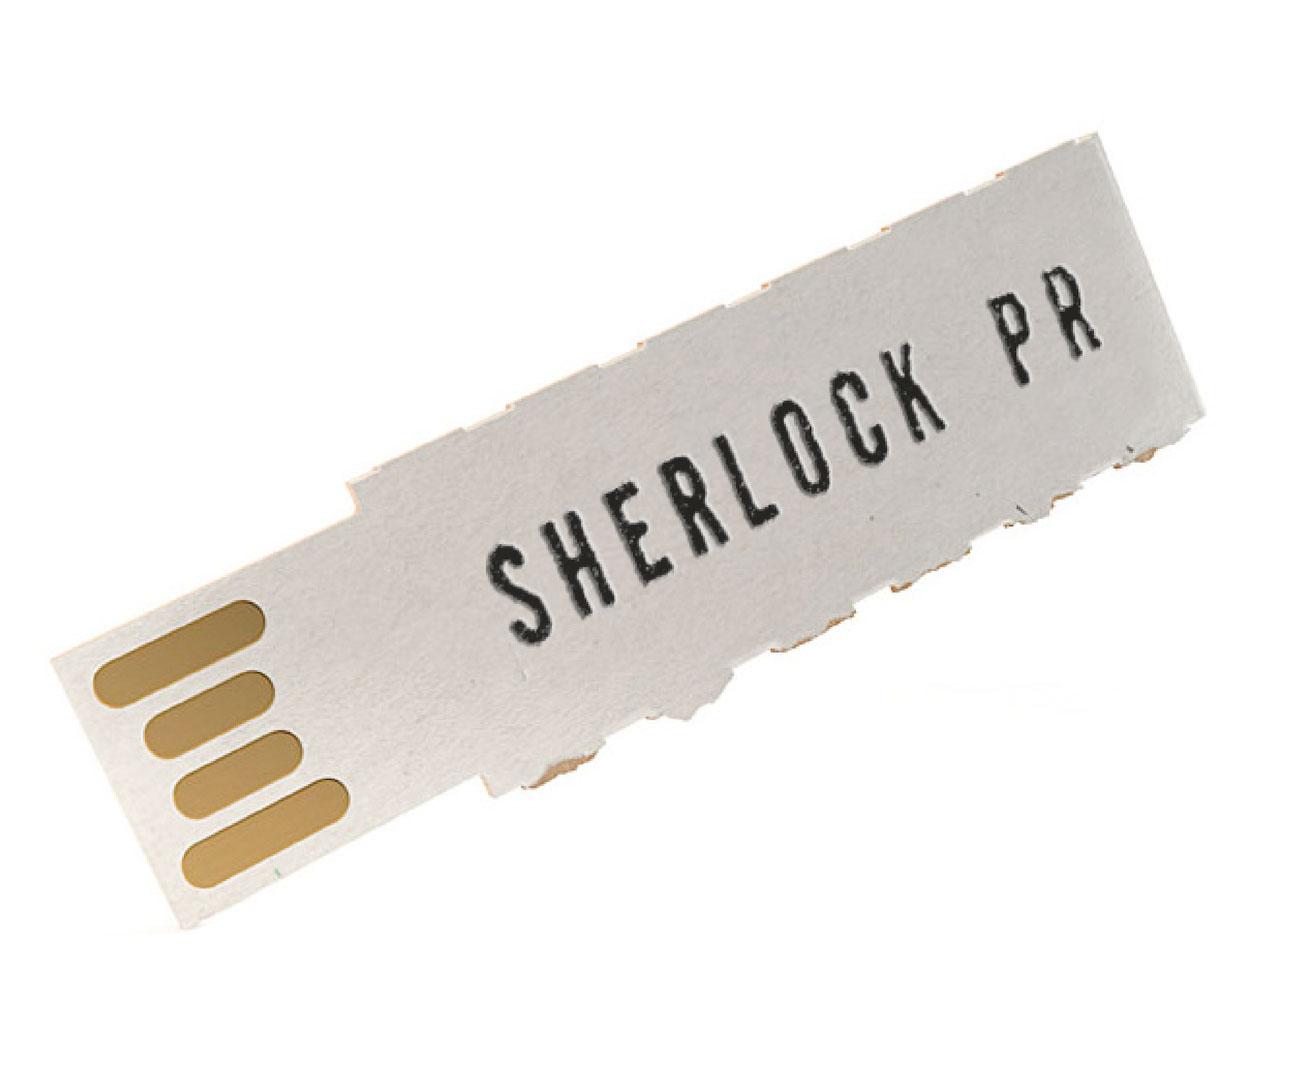 Rebranding for Brighton based PR Consultancy - Memory Stick Design